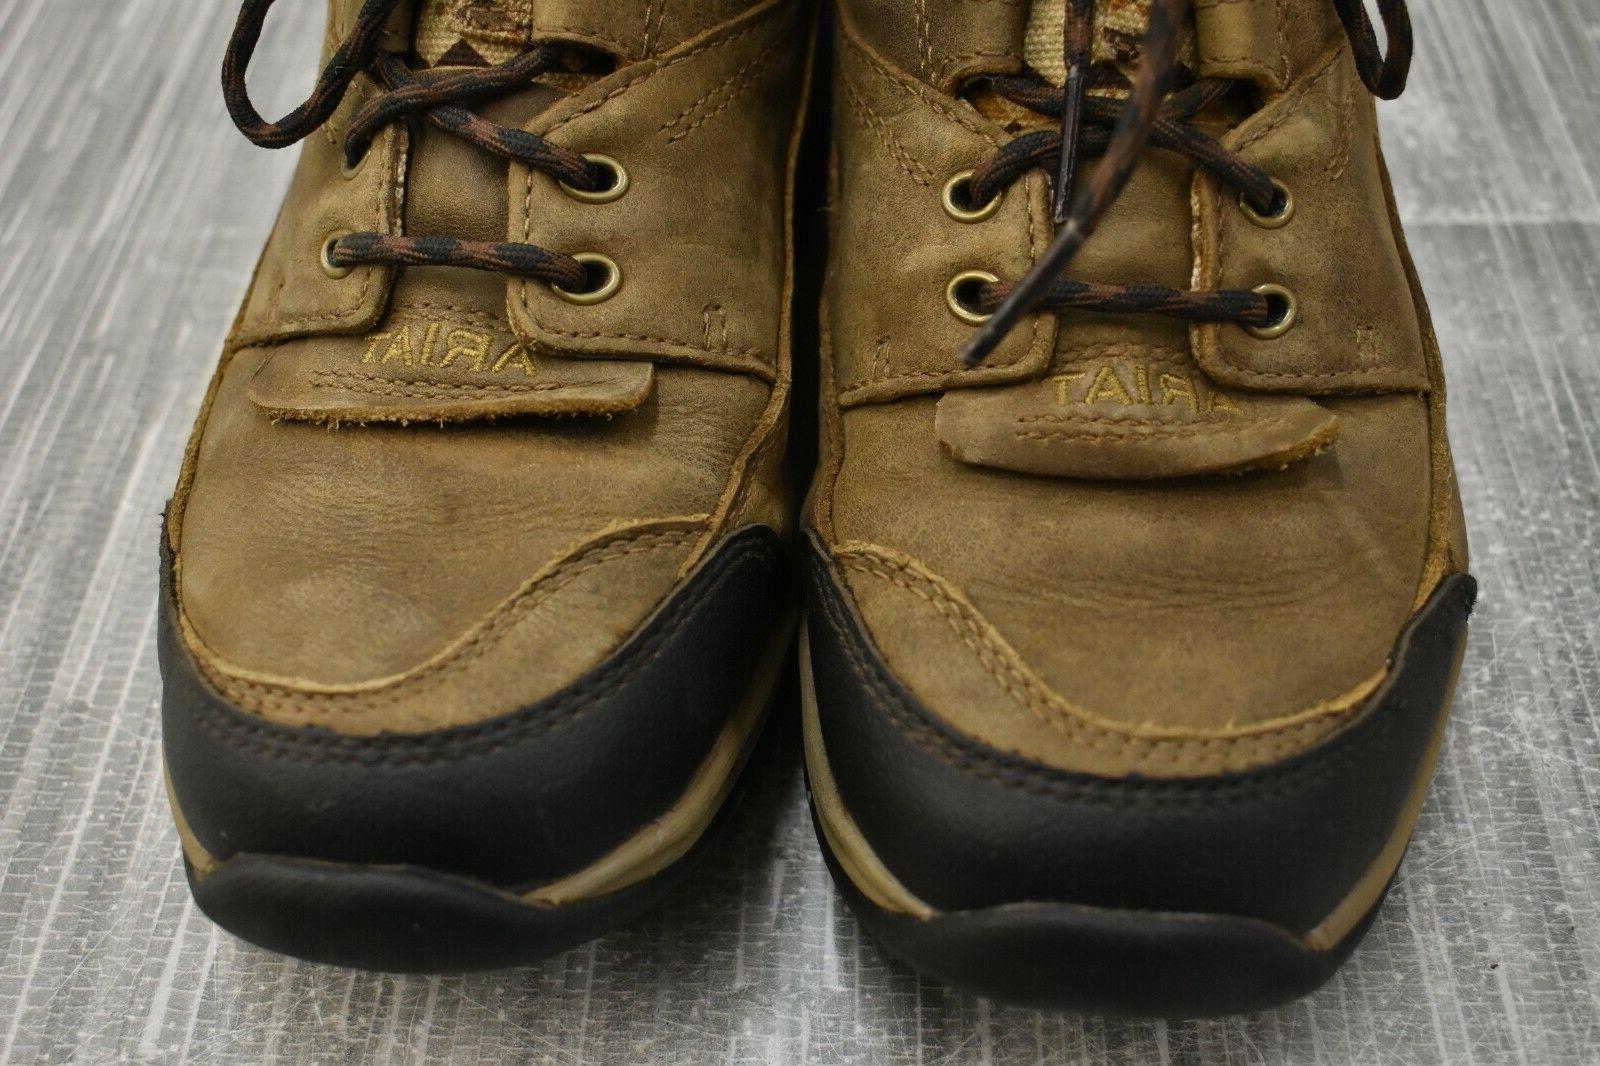 Ariat Terrain 10033925 Hiking Boots, Women's Size B, Brown